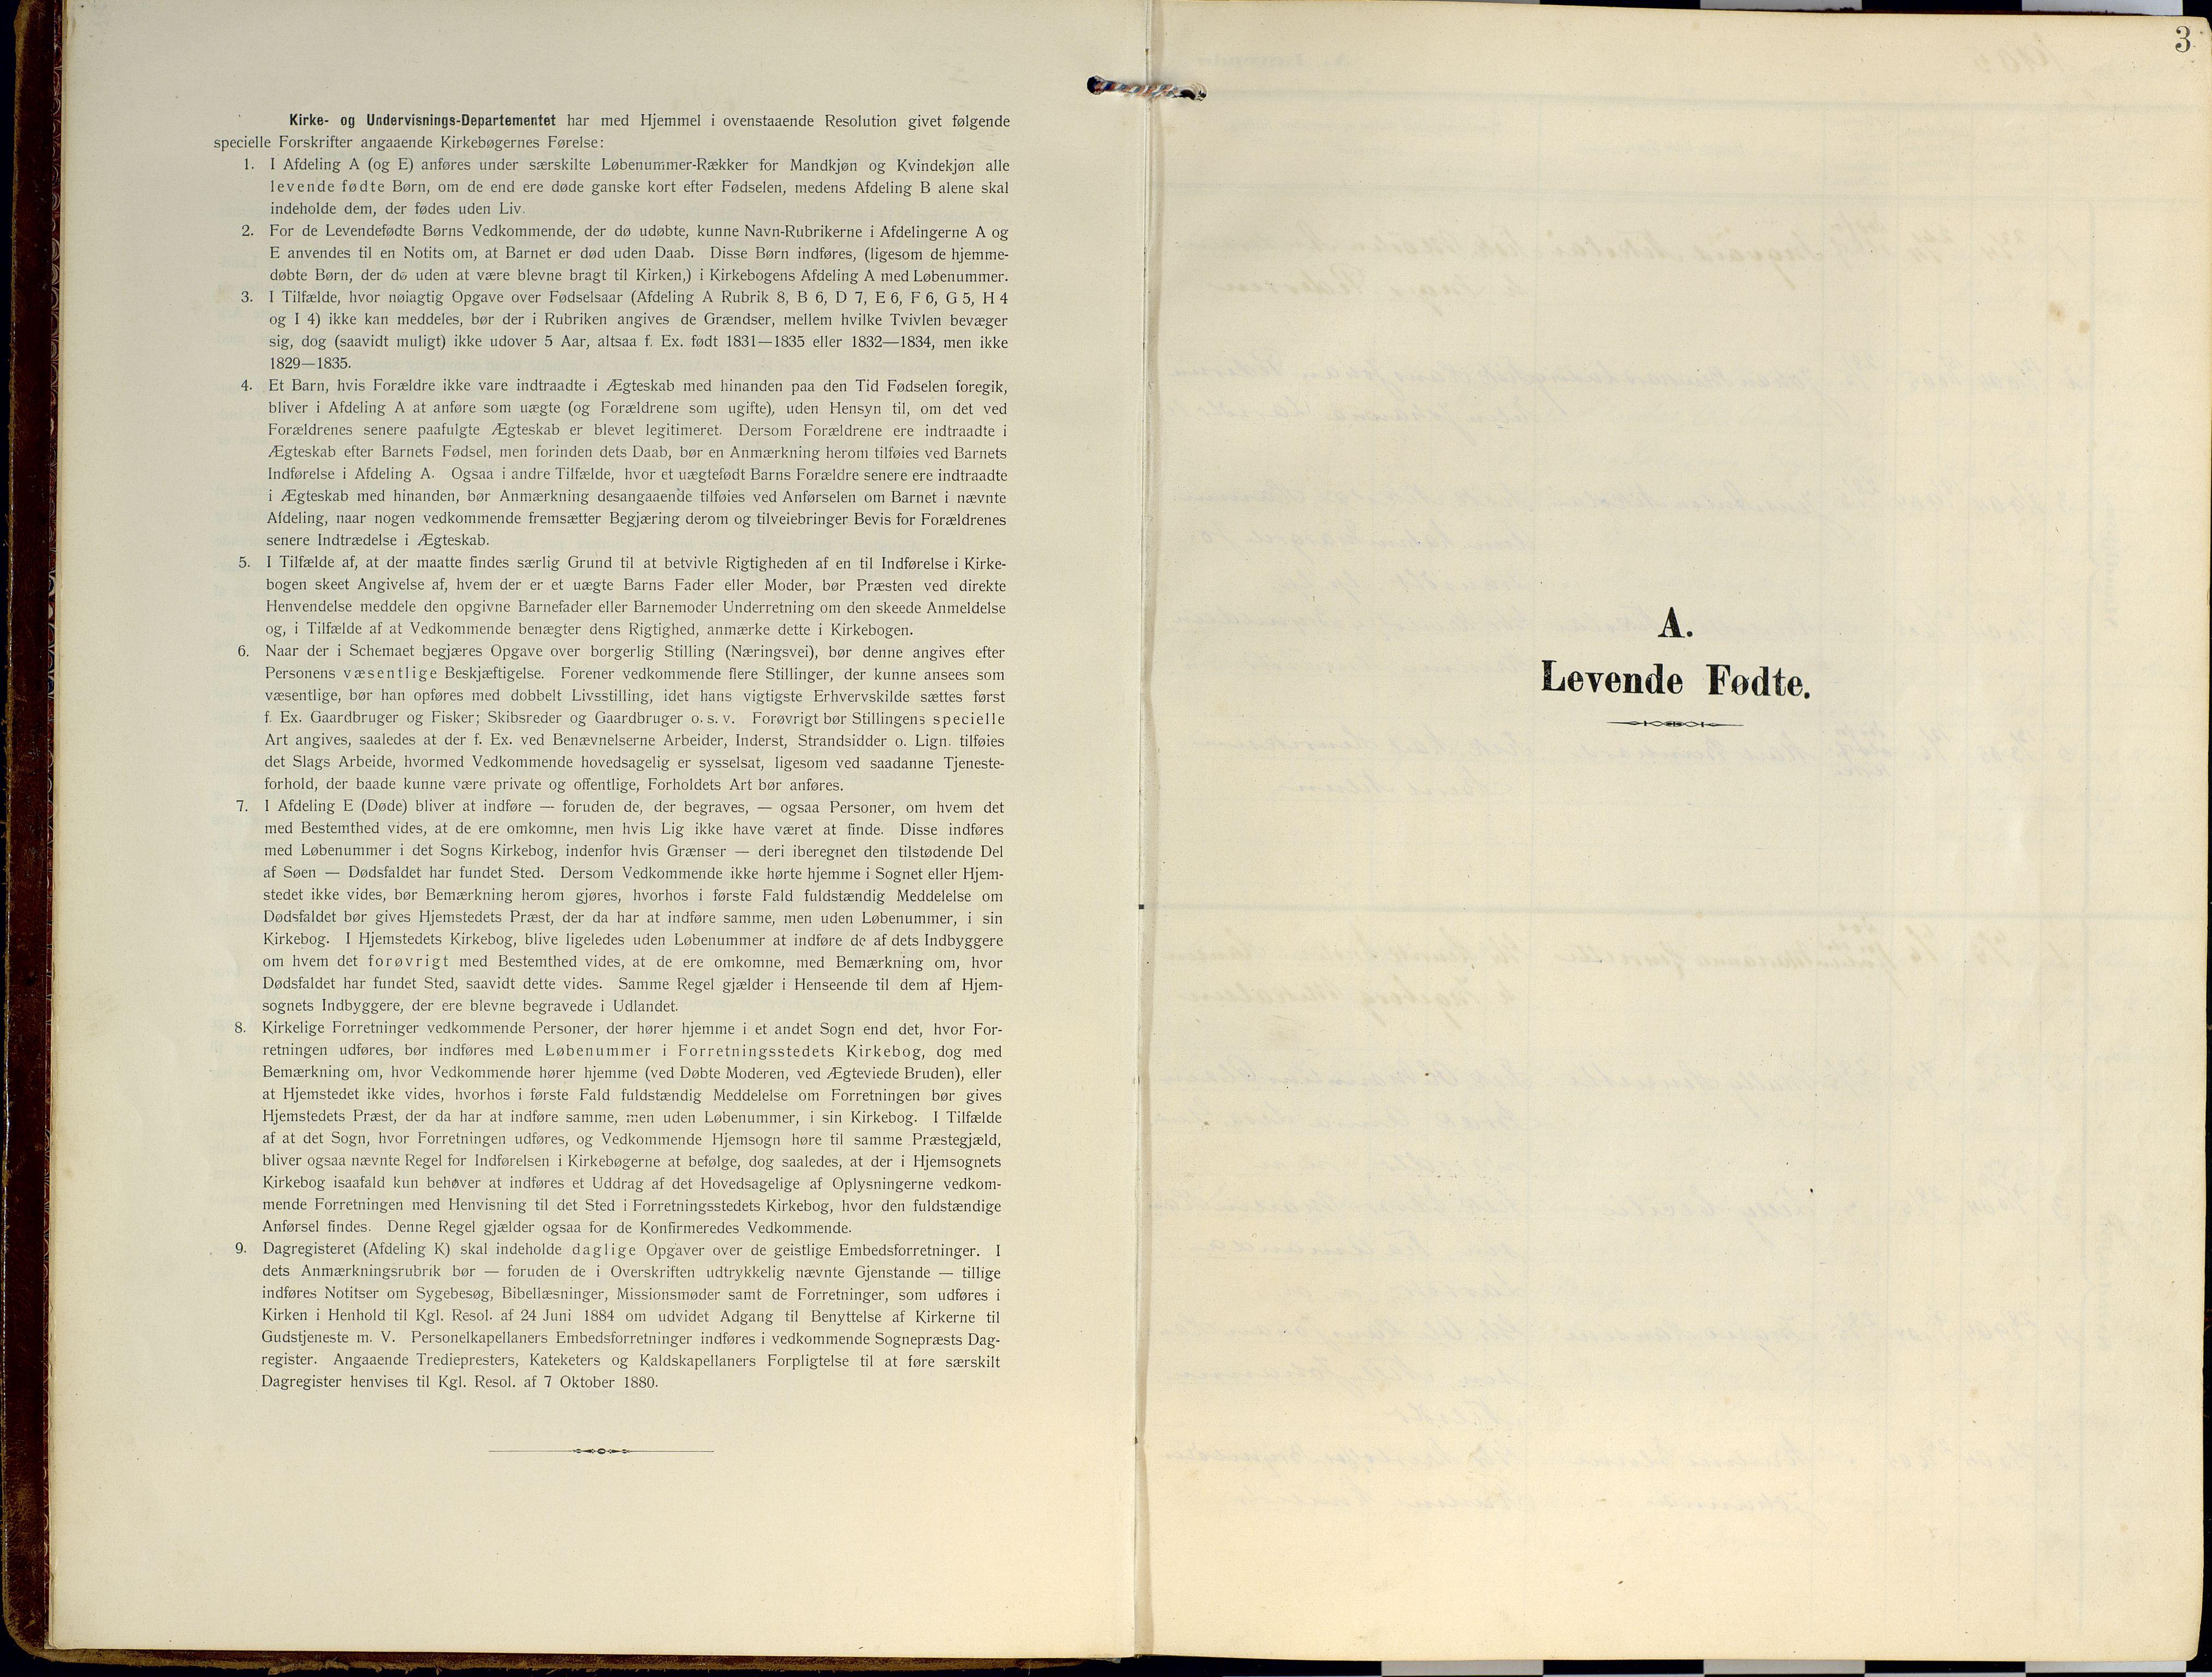 SATØ, Lyngen sokneprestembete, Ministerialbok nr. 14, 1905-1920, s. 3